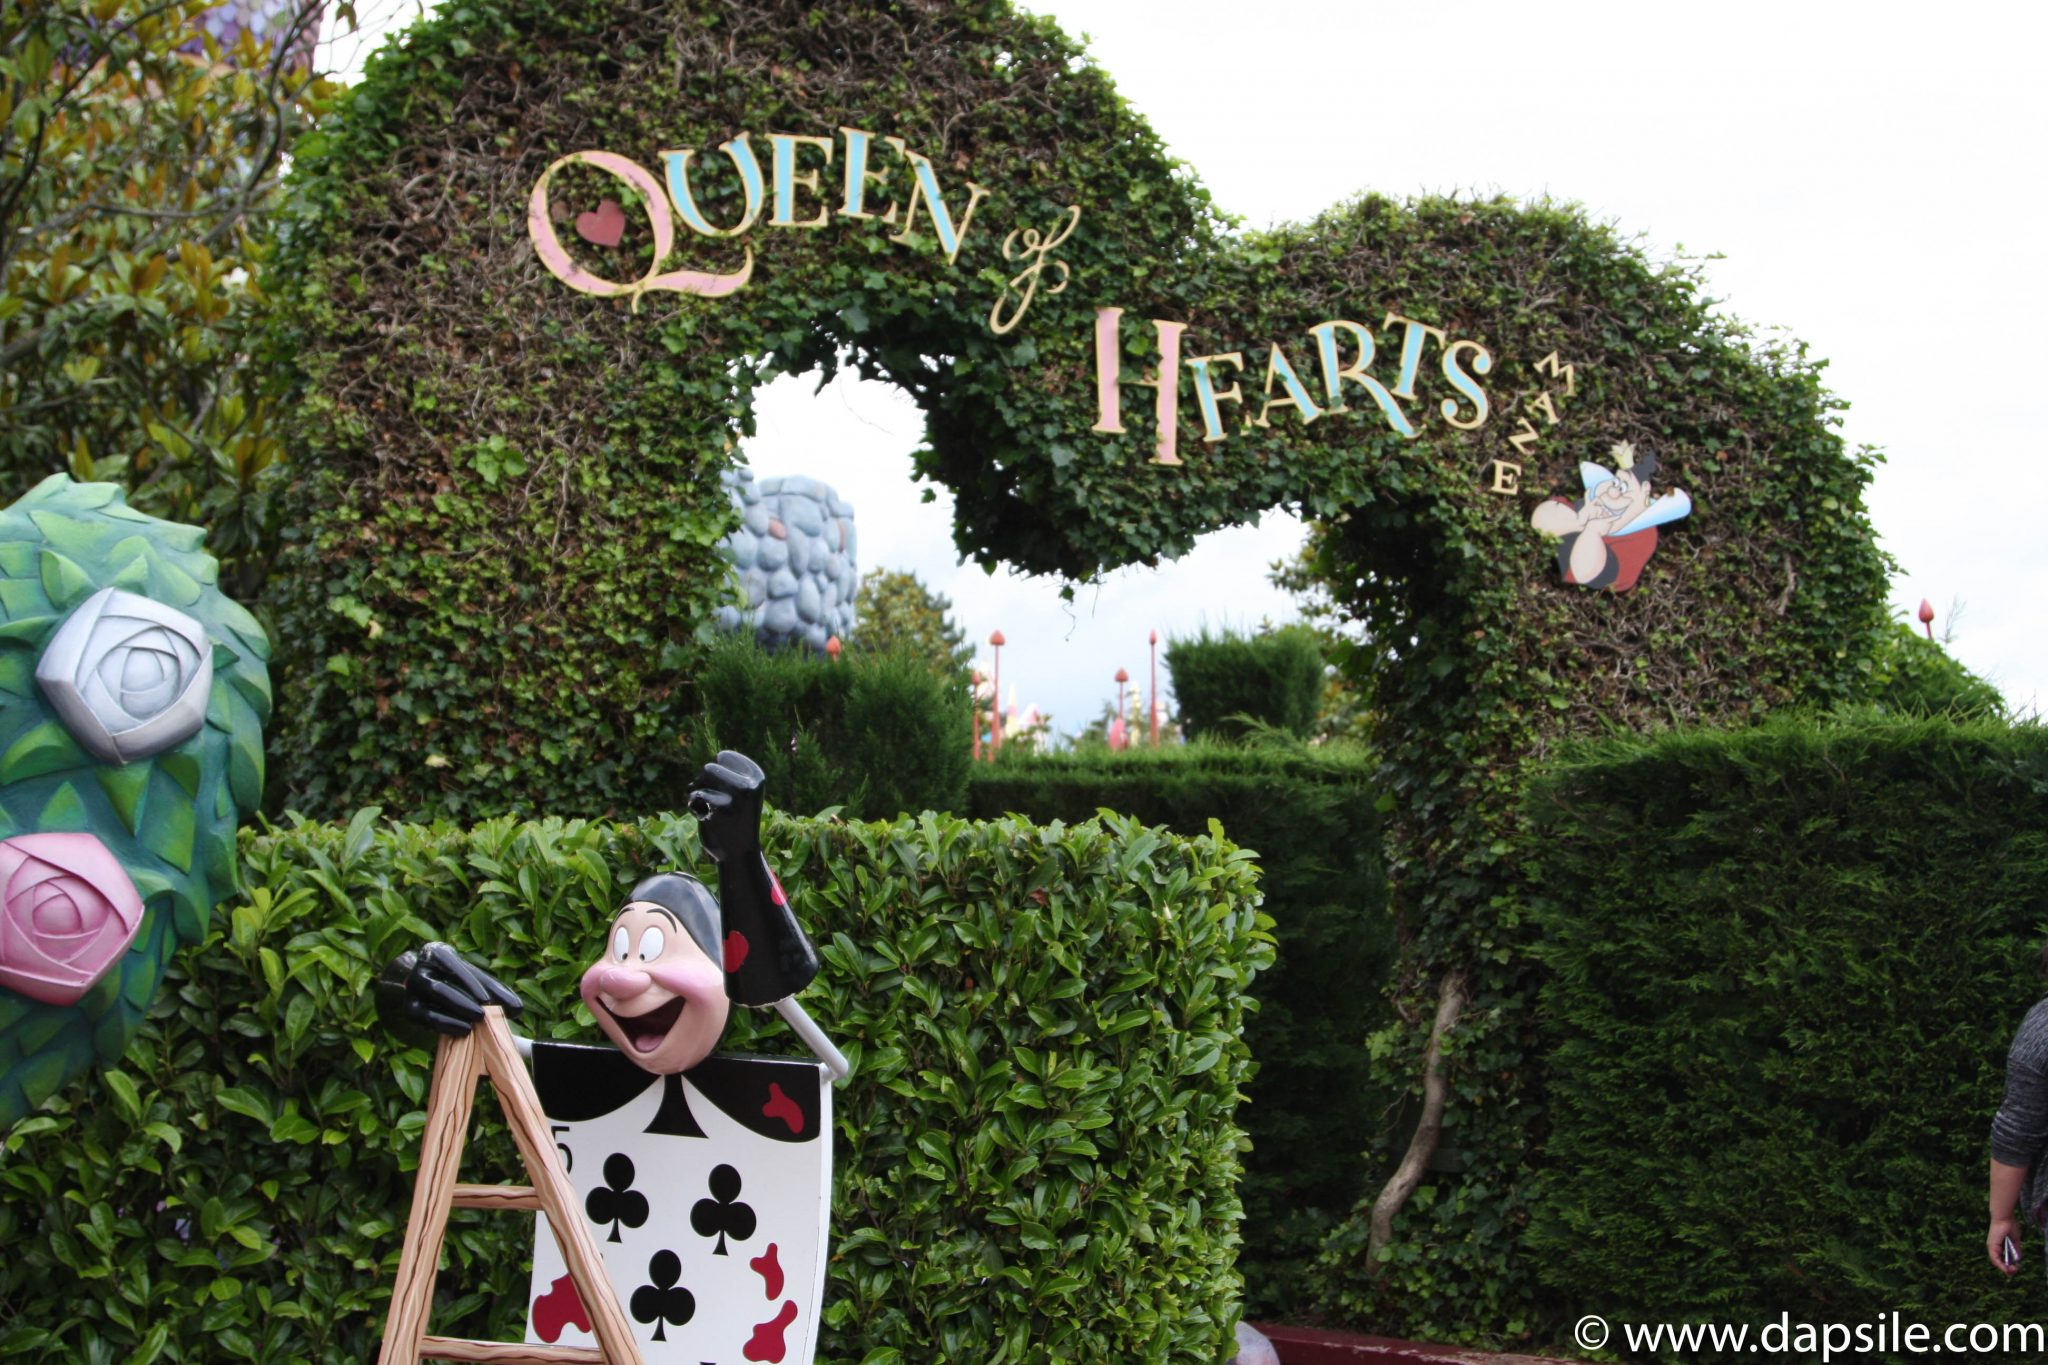 Queen of Hearts Maze Entrance in Disneyland Paris Sights